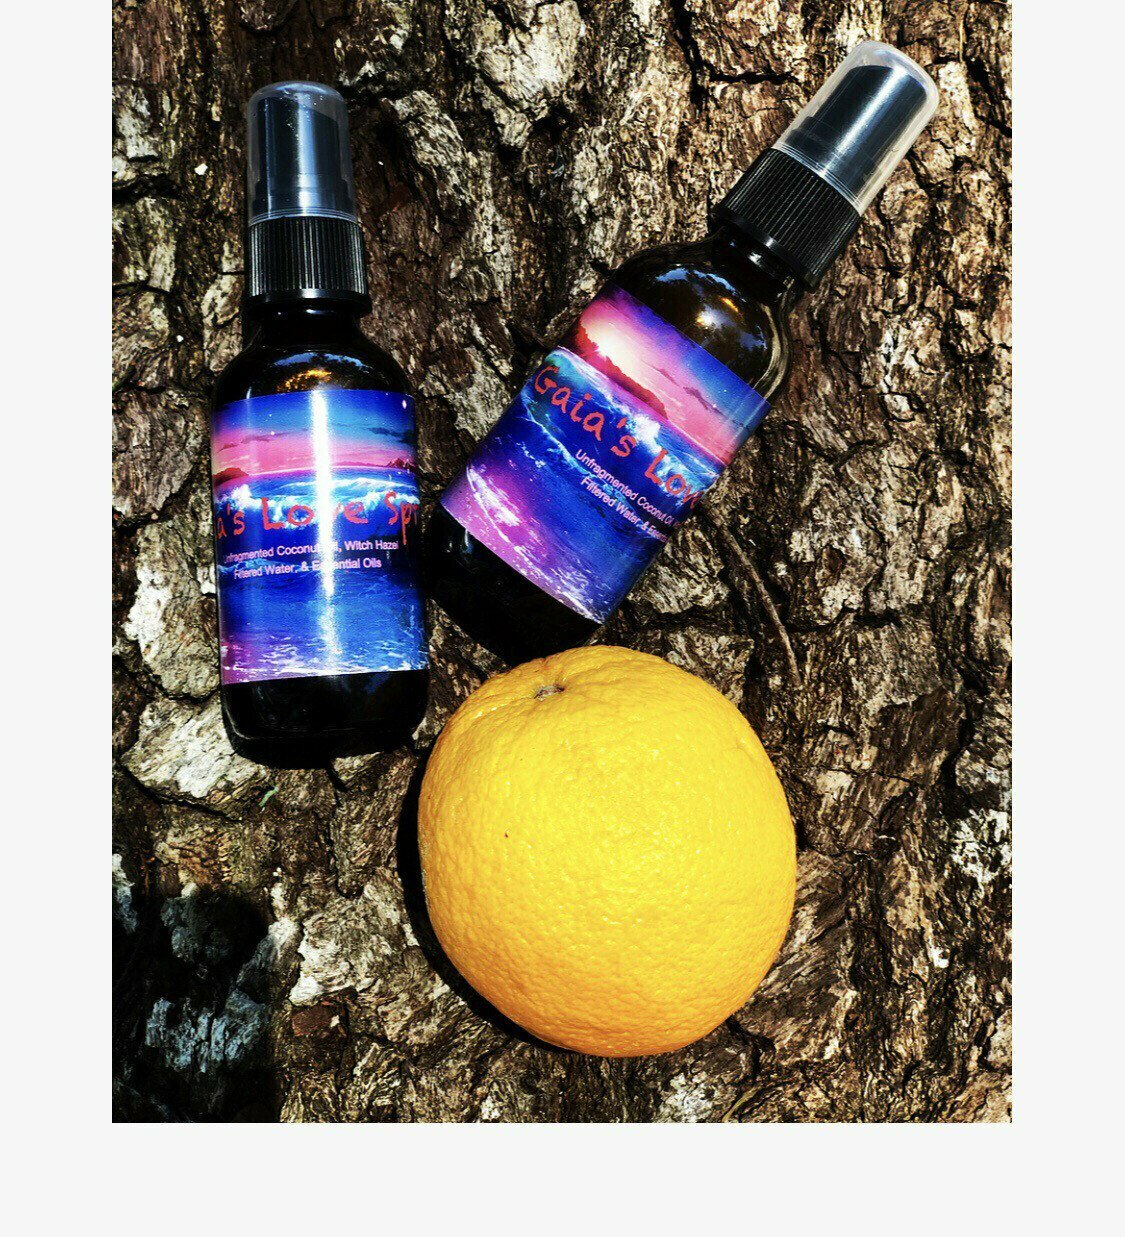 Gaia's Plasma Love Spray